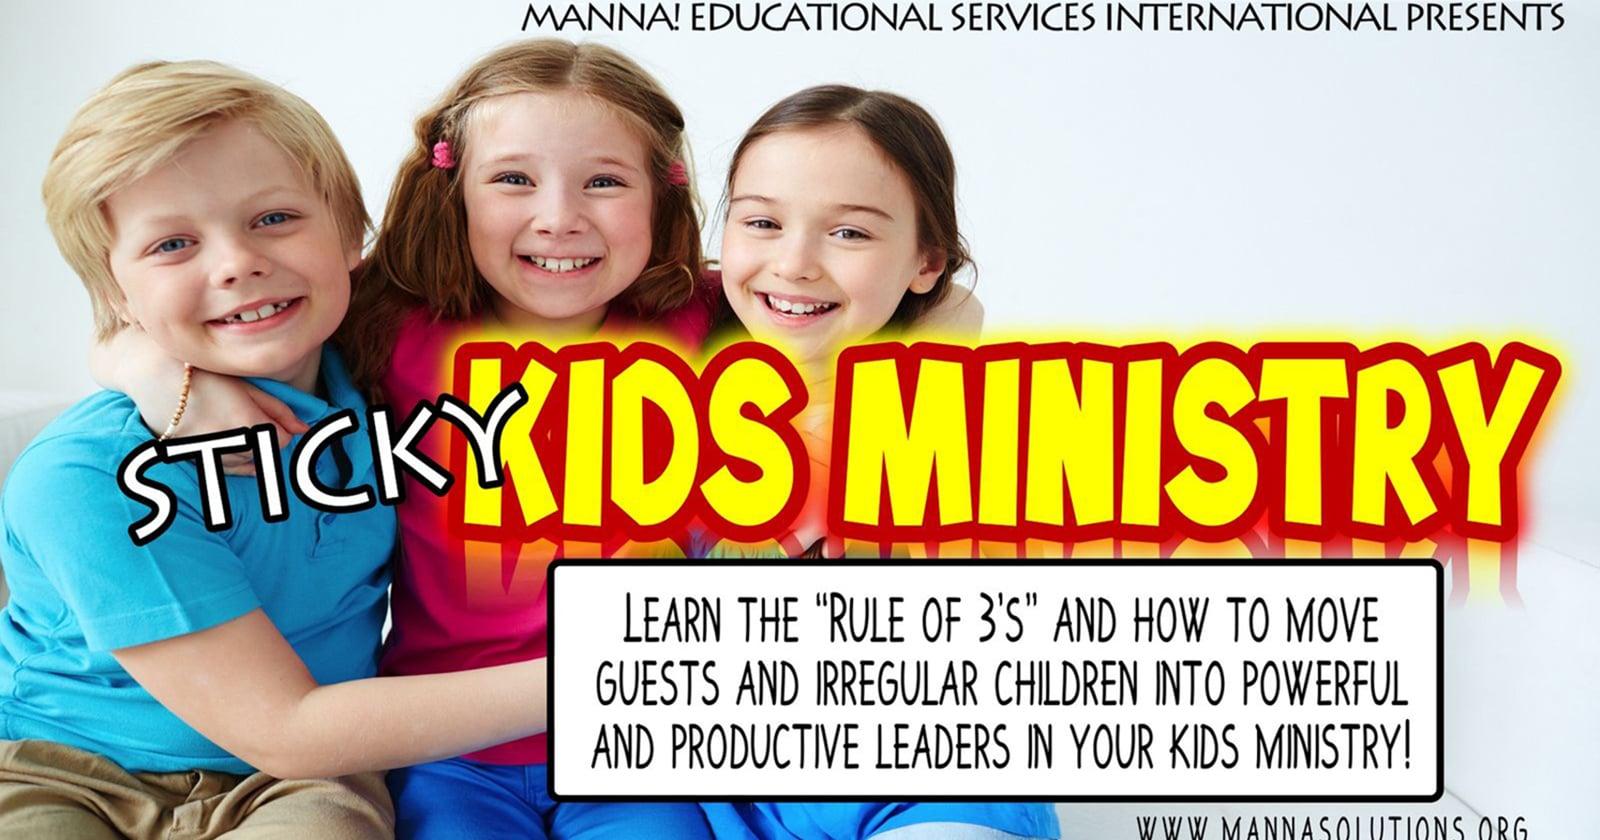 Sticky Childrens Ministry Workshop